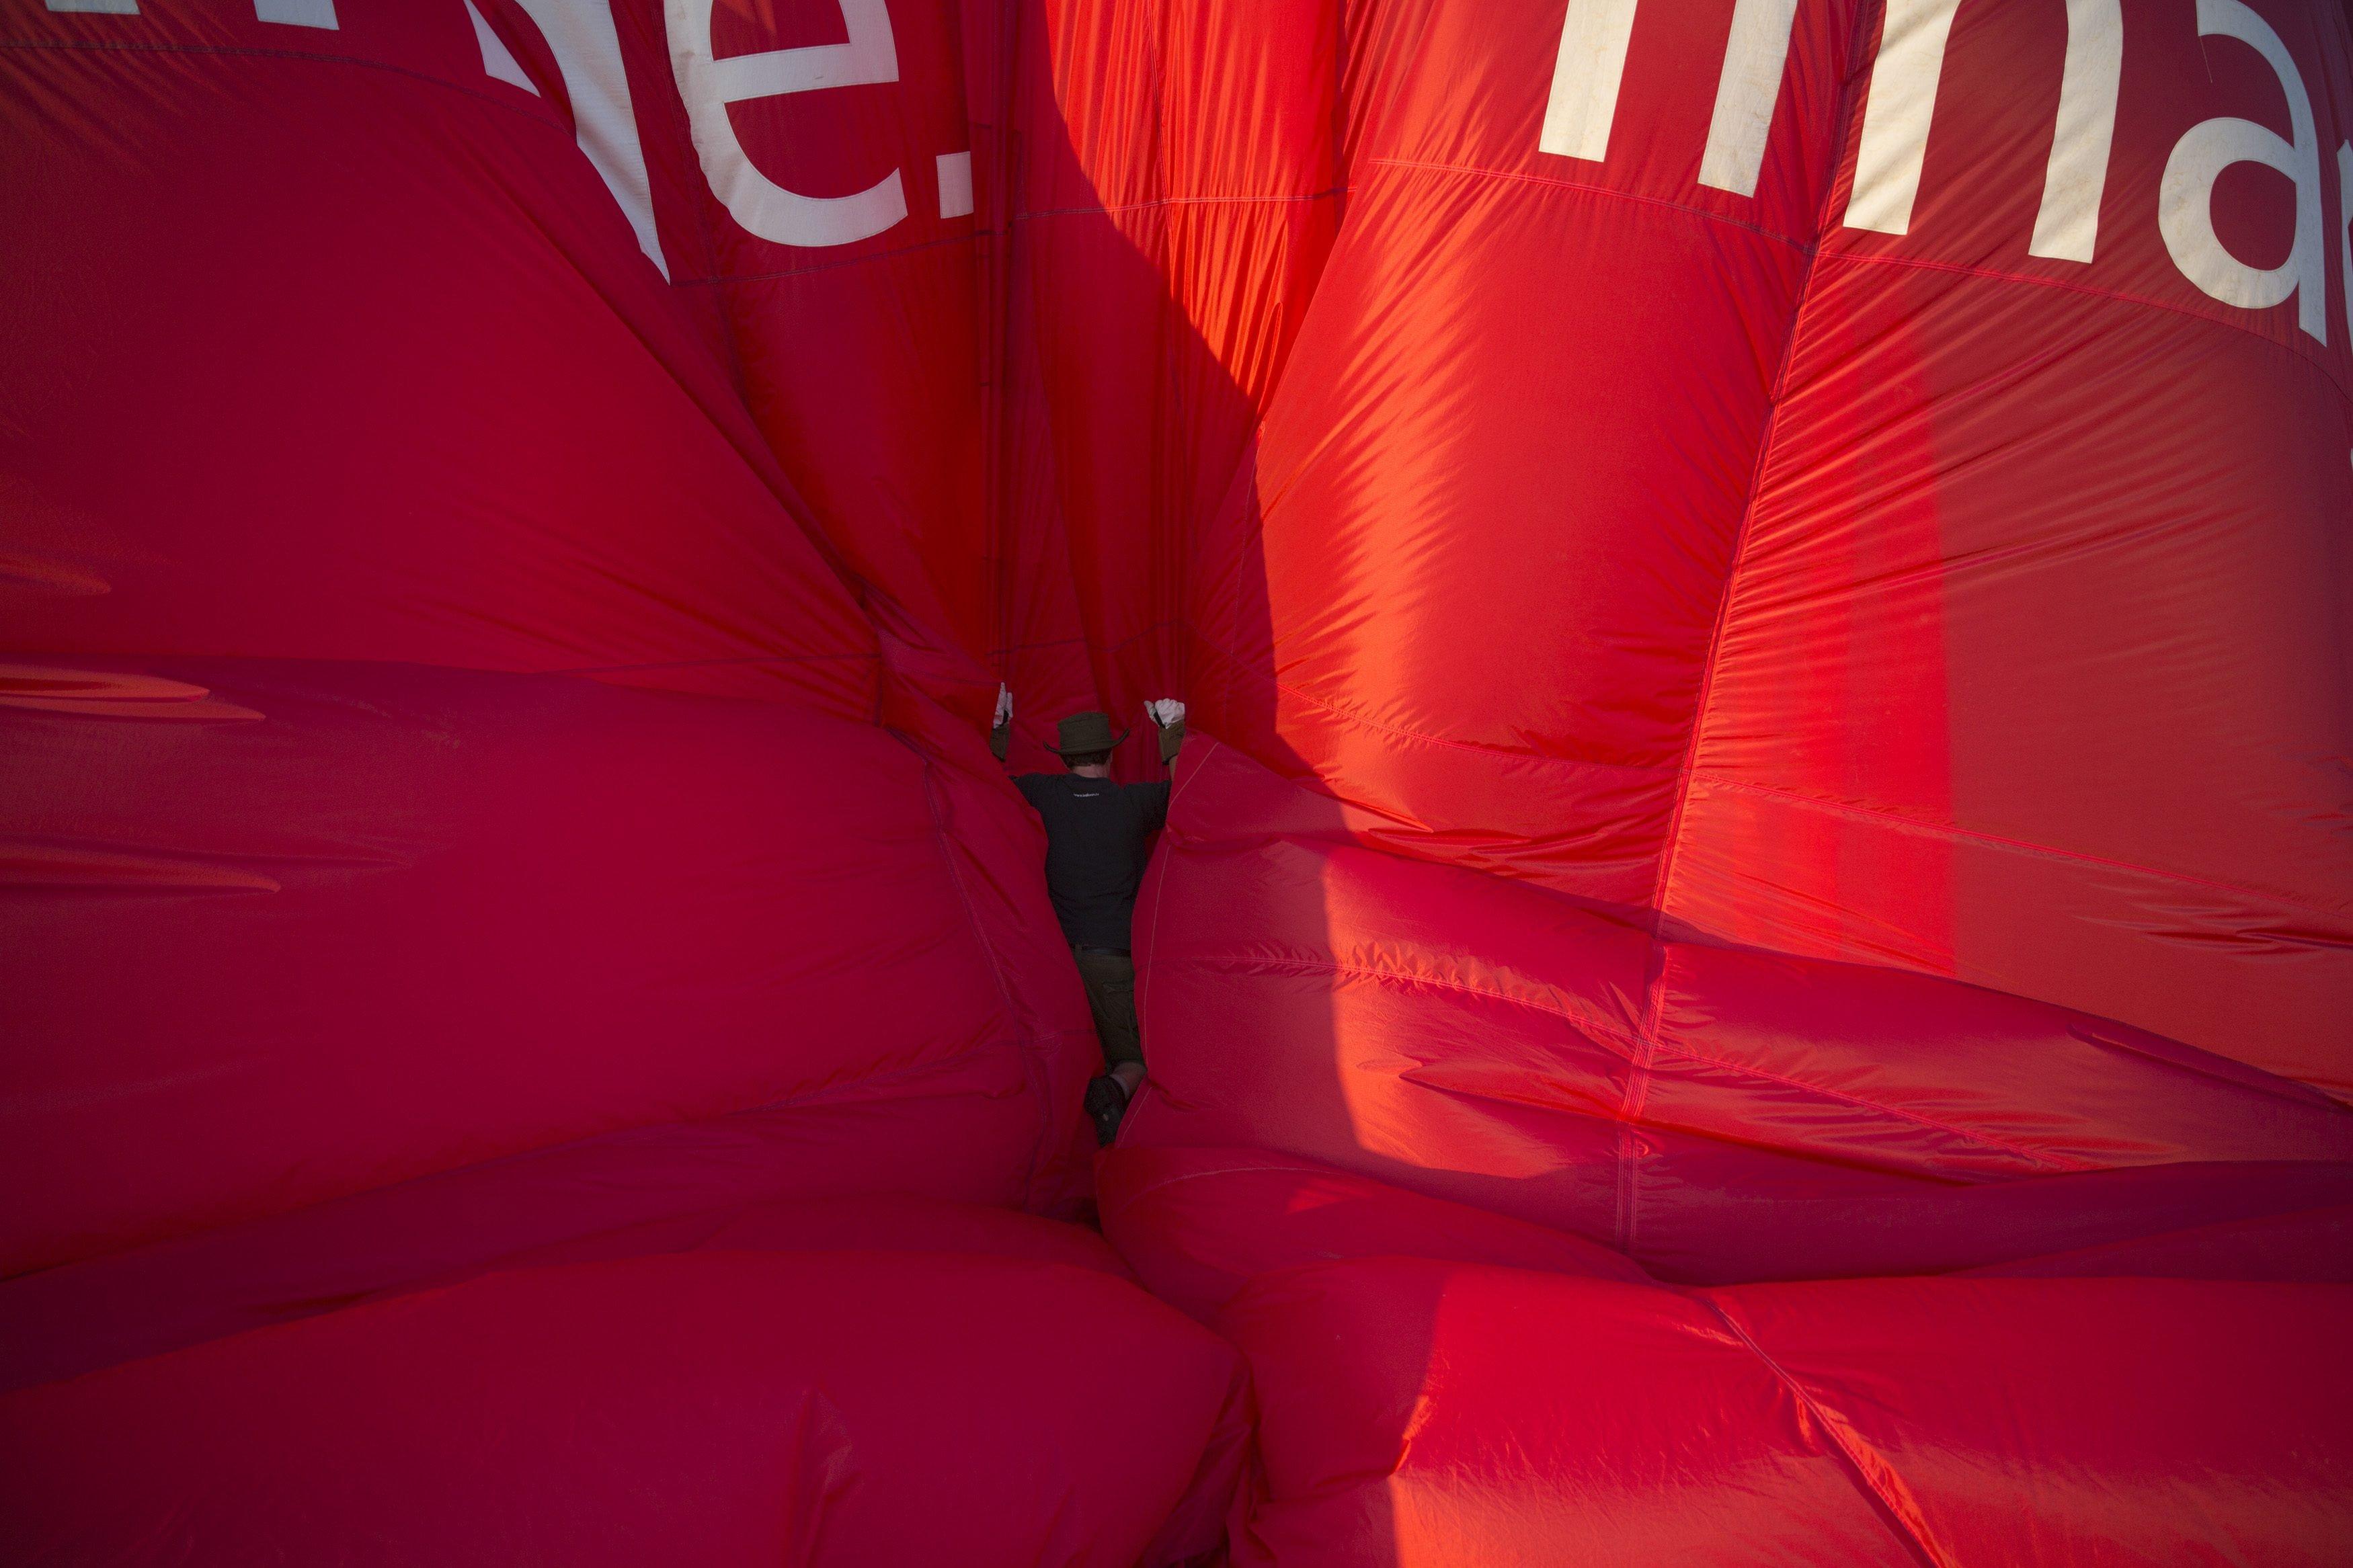 Aug. 7, 2014. A balloonist checks a balloon as it is deflated at the International Balloon Fiesta near Bristol in western England.